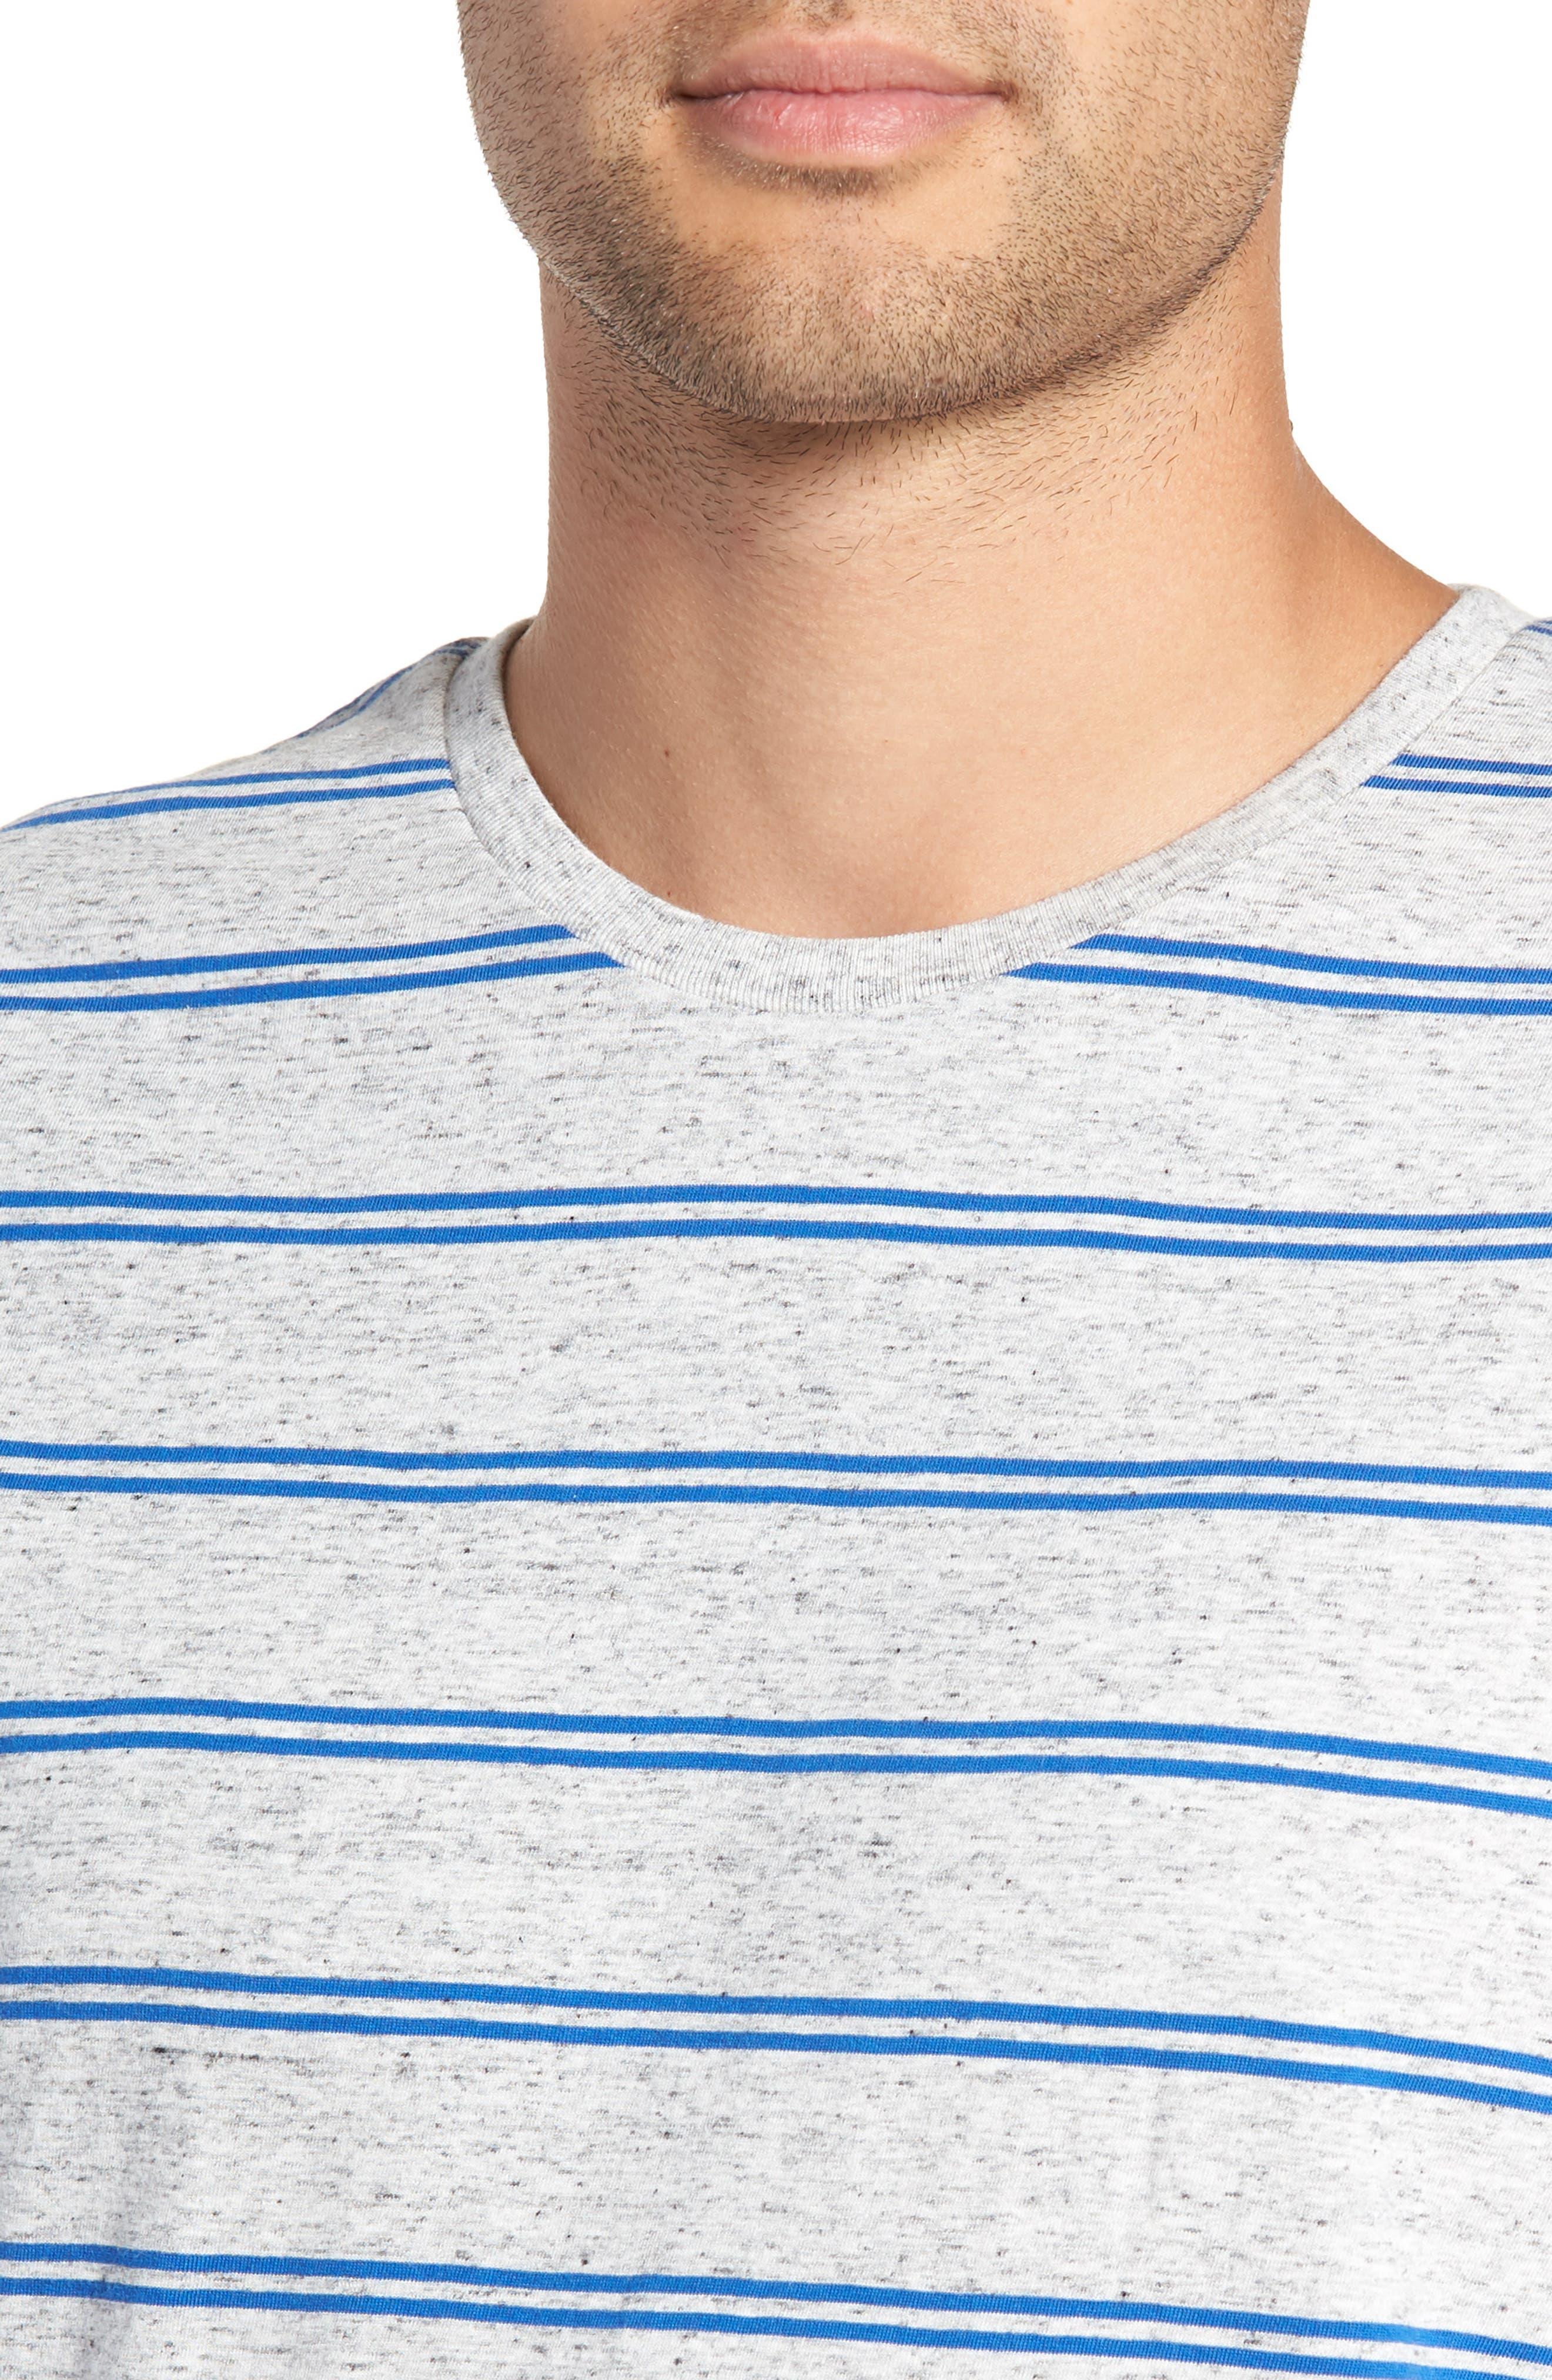 Flintlock T-Shirt,                             Alternate thumbnail 4, color,                             STORM MARLE/ COBALT